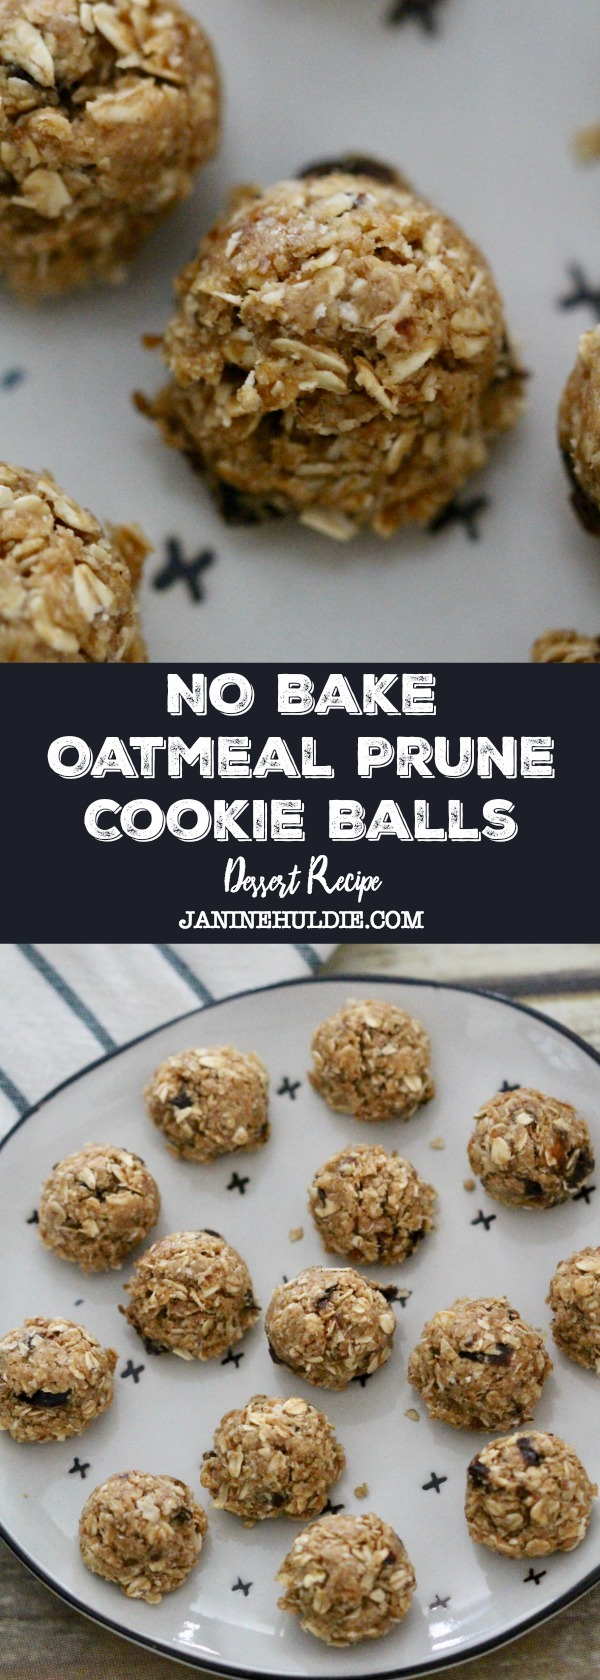 No Bake Oatmeal Prune Cookie Balls Recipe